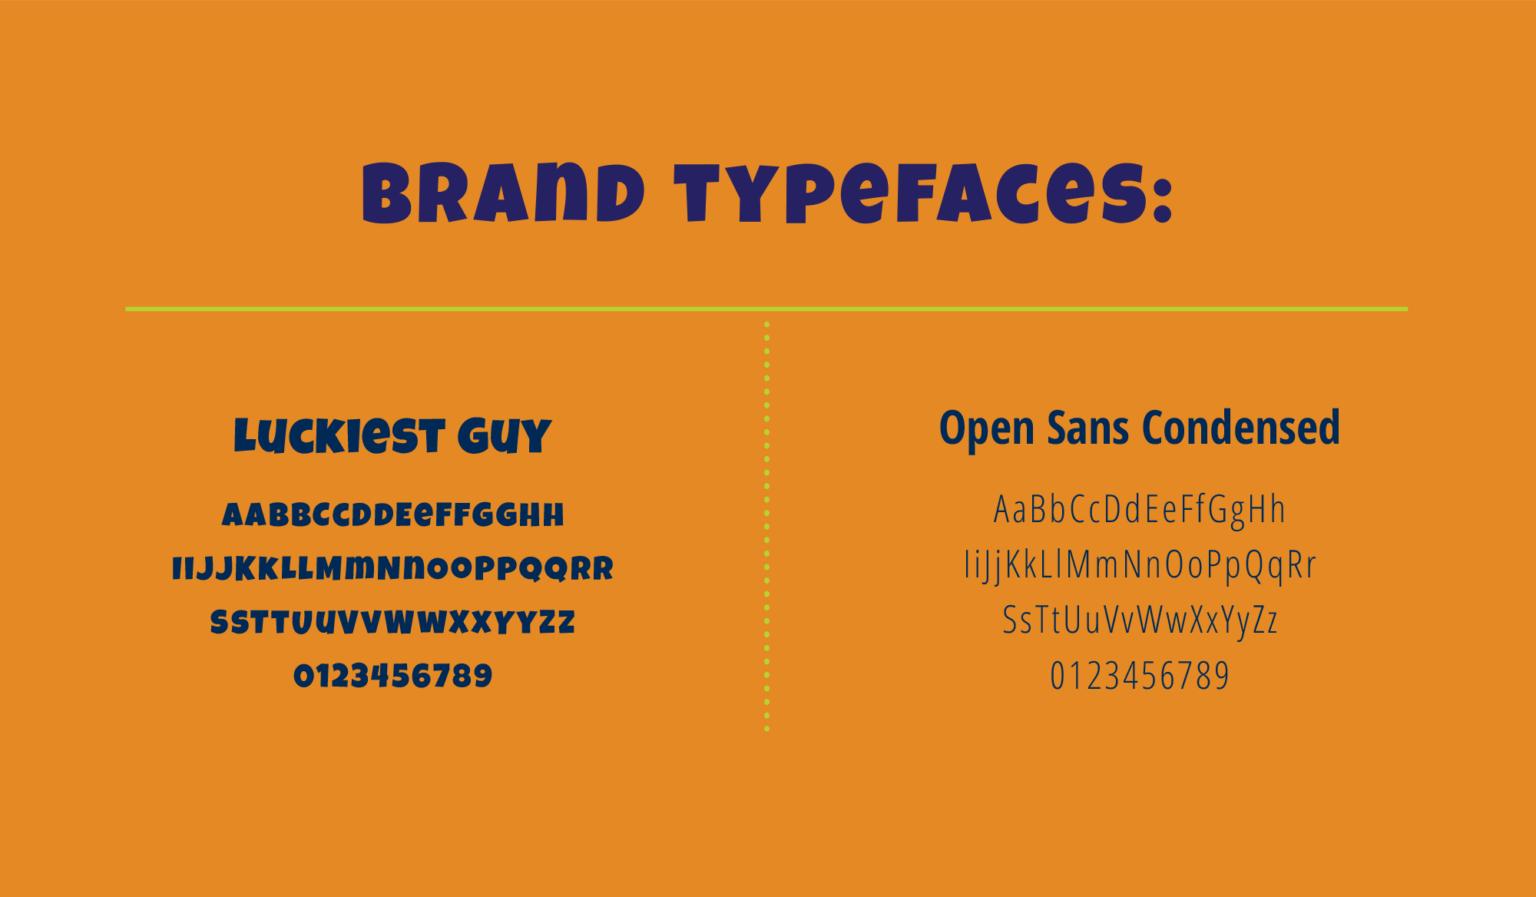 SB brand typography